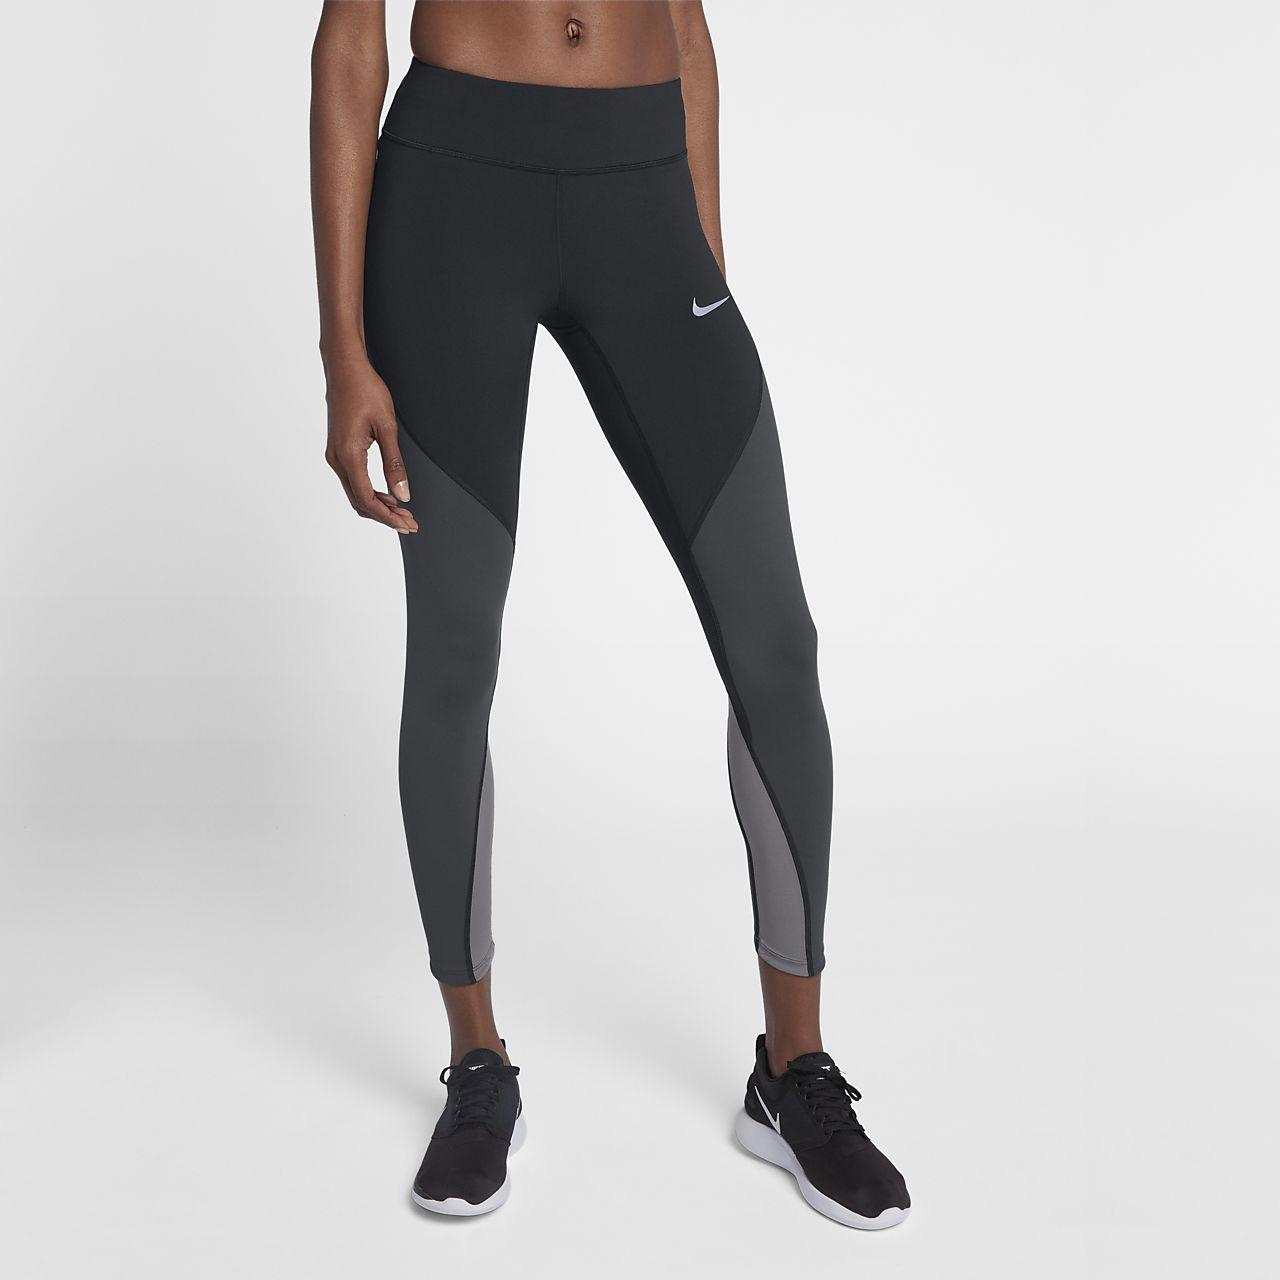 Nike Epic Lux Women's Running GB